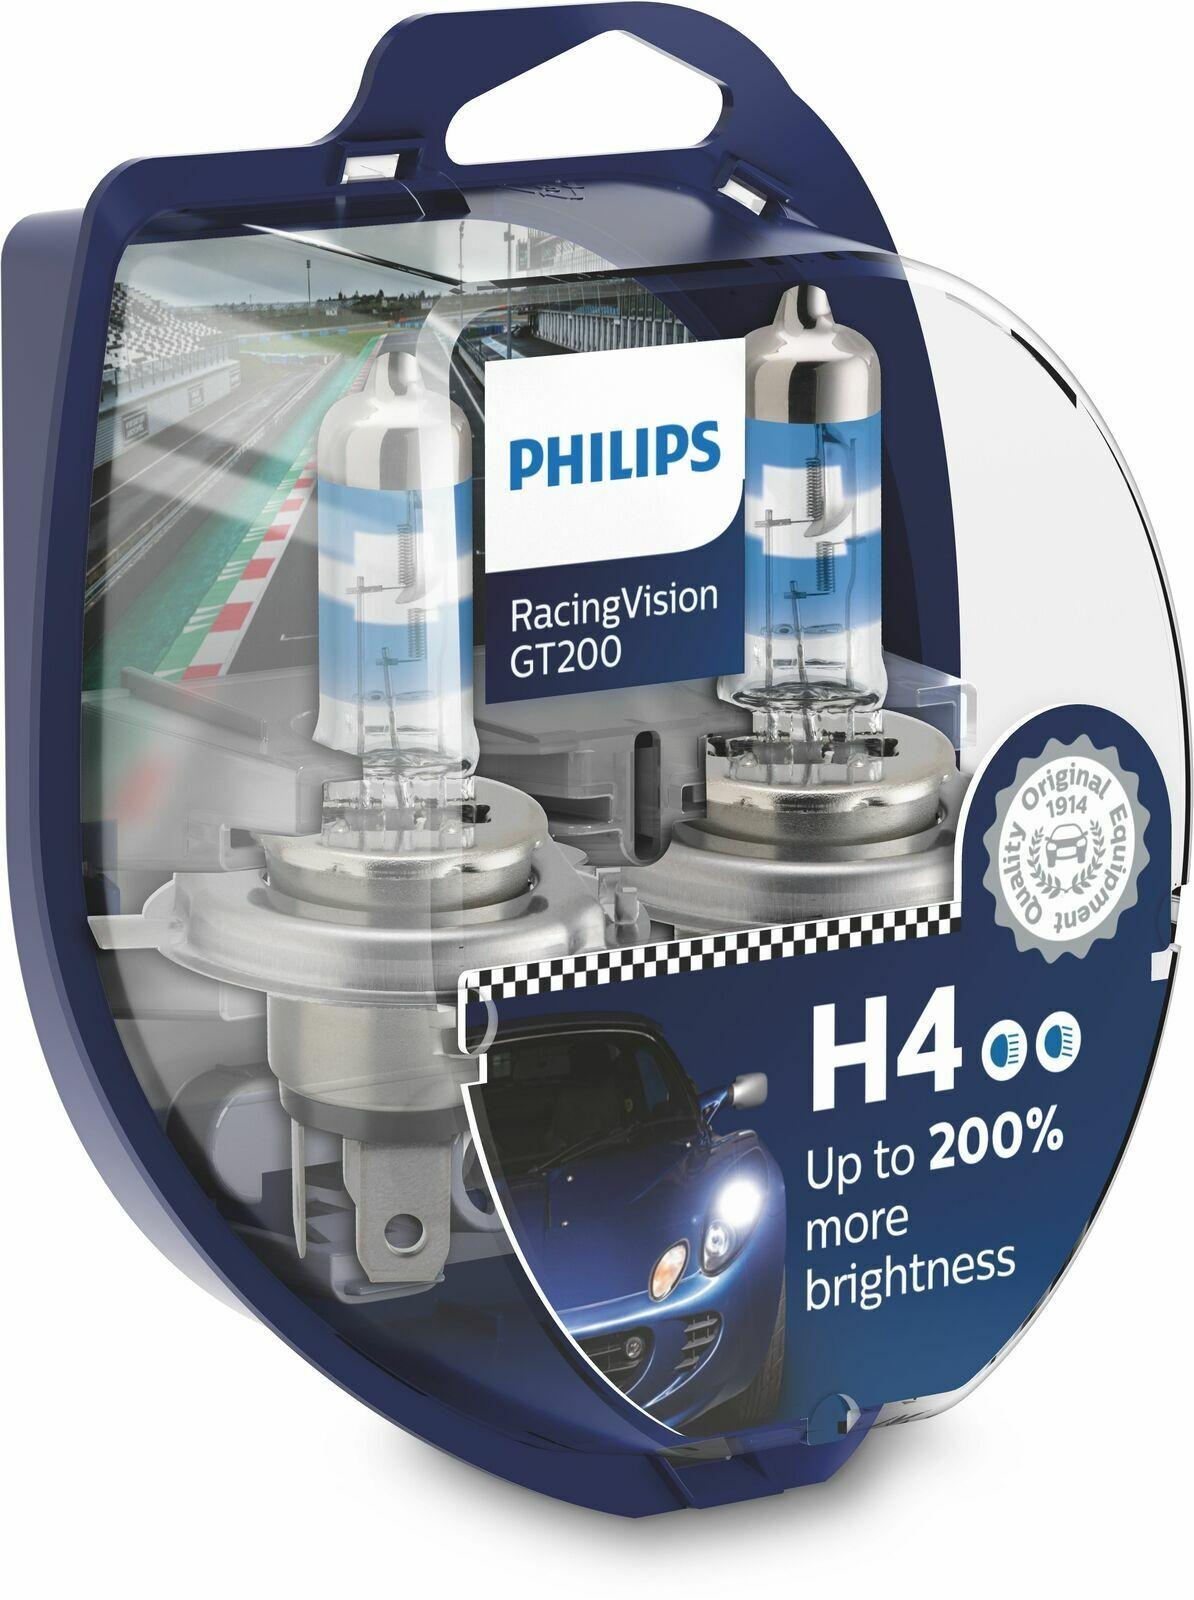 Car Parts - Philips RacingVision GT200 Car Headlight Bulbs H4 (Twin) *NEW 2020* 12342RGT200